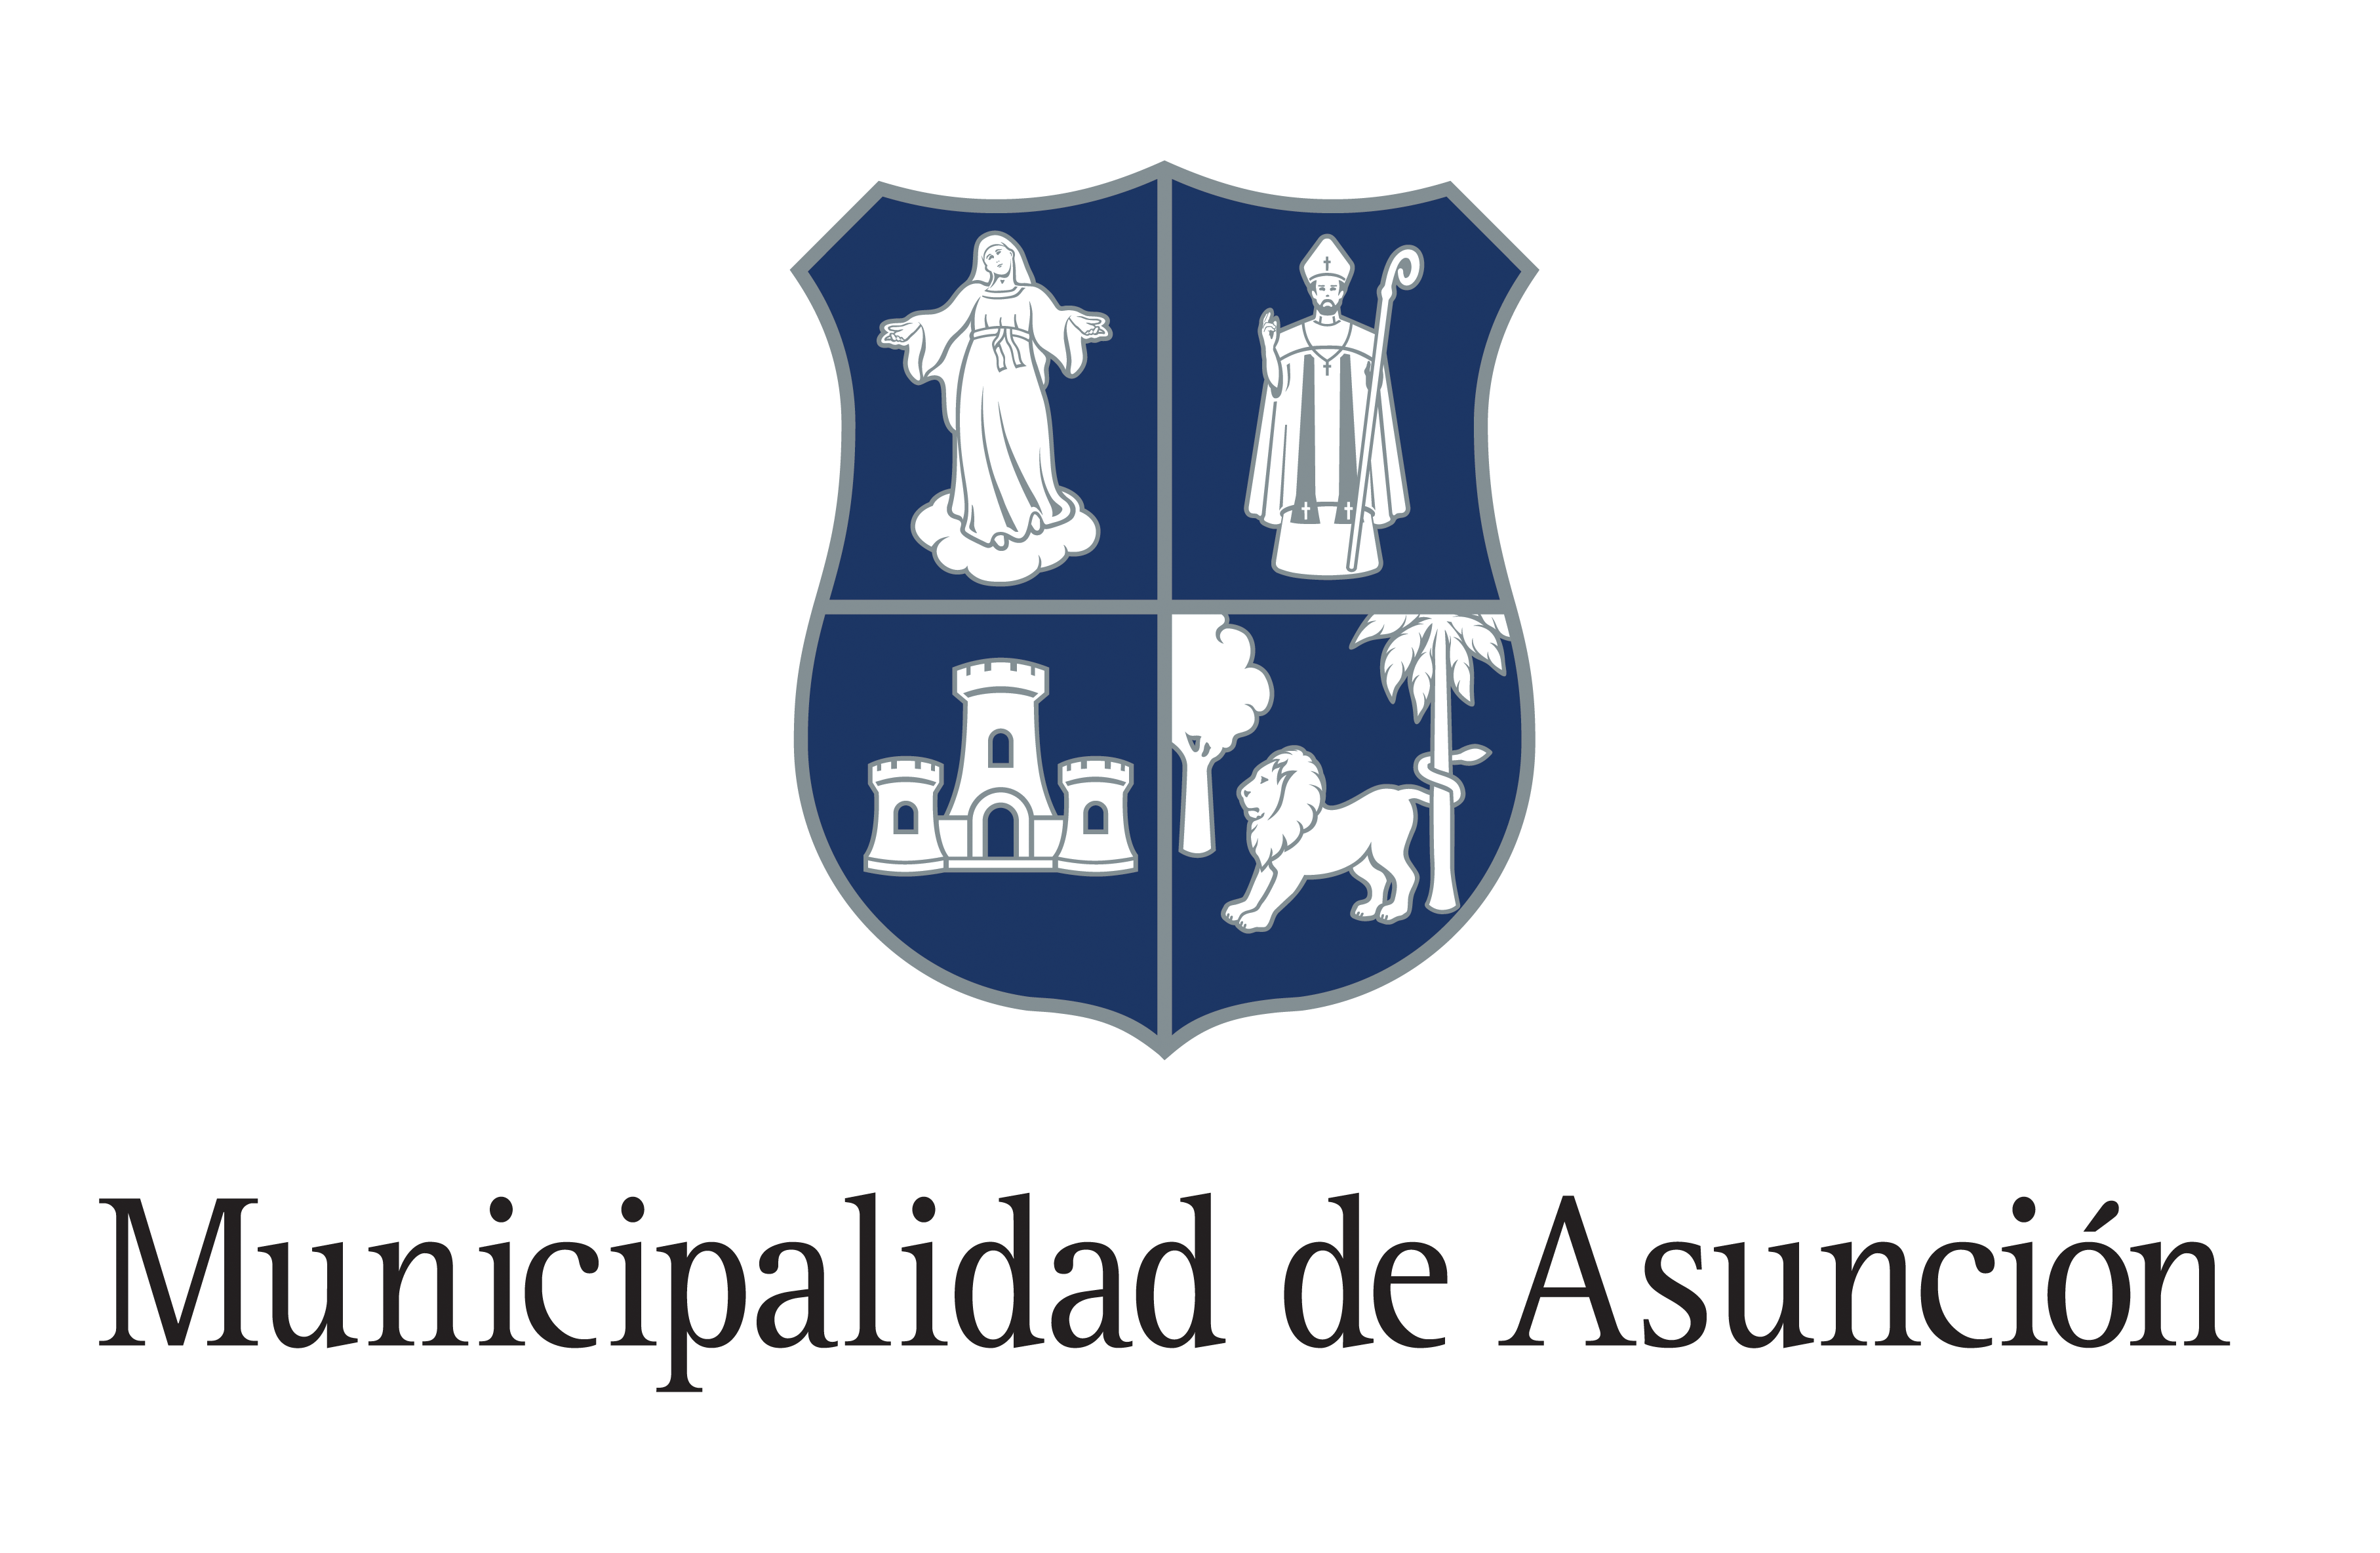 logo municipalidad de asunci243n